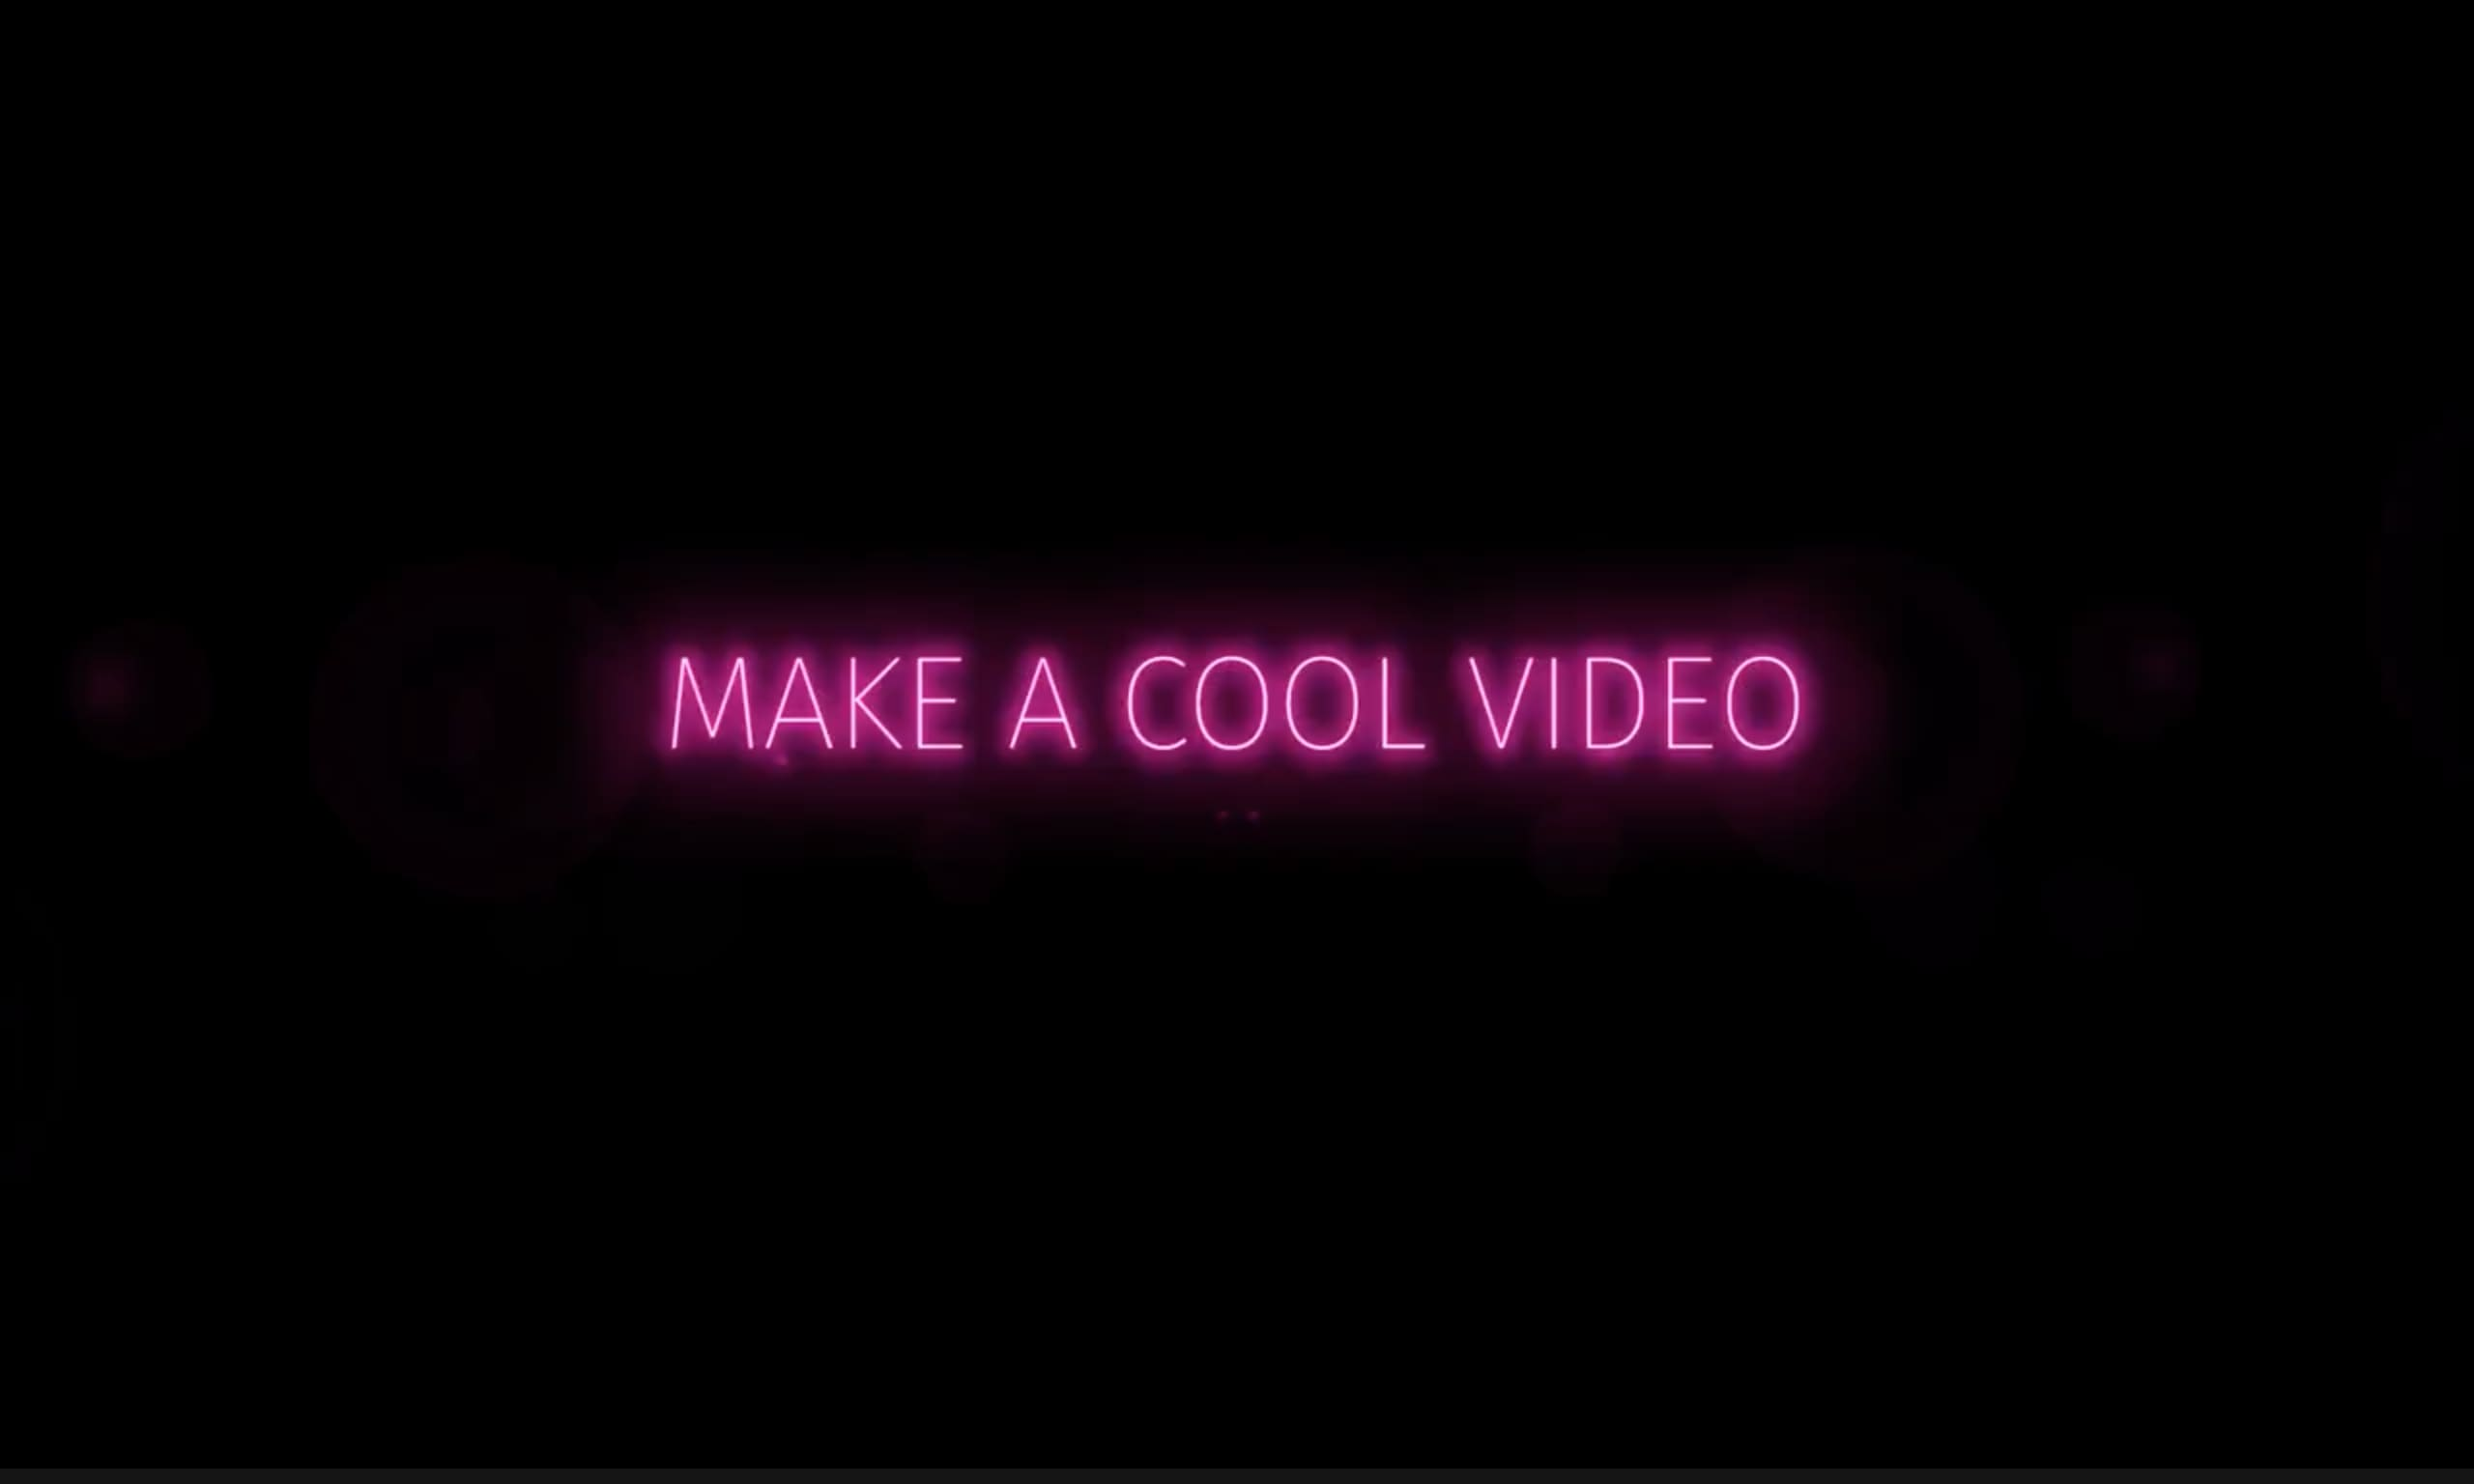 Premiere Pro text animation